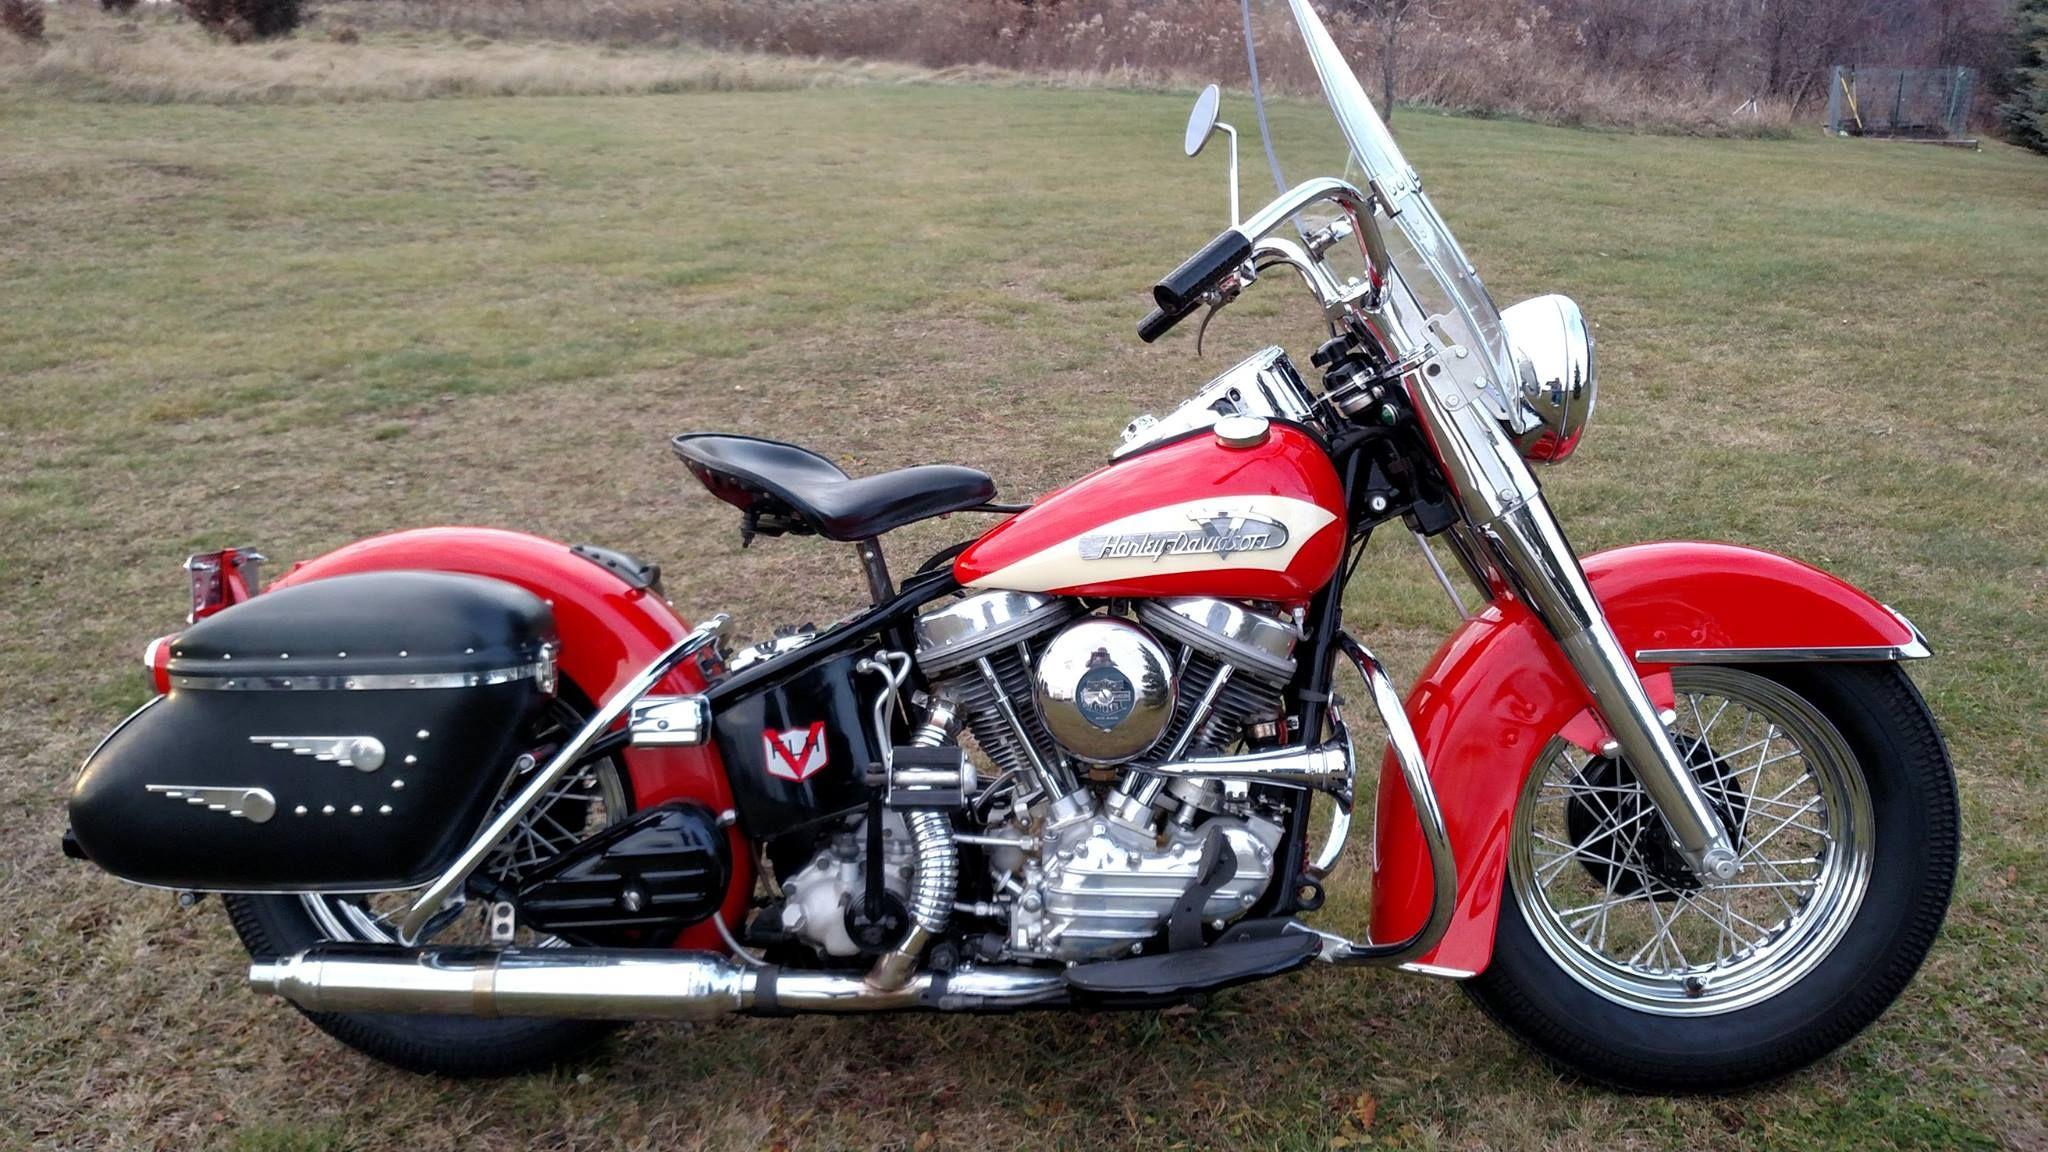 1956 Panhead Flh Harley Bikes Harley Davidson History Harley Davidson Motorcycles